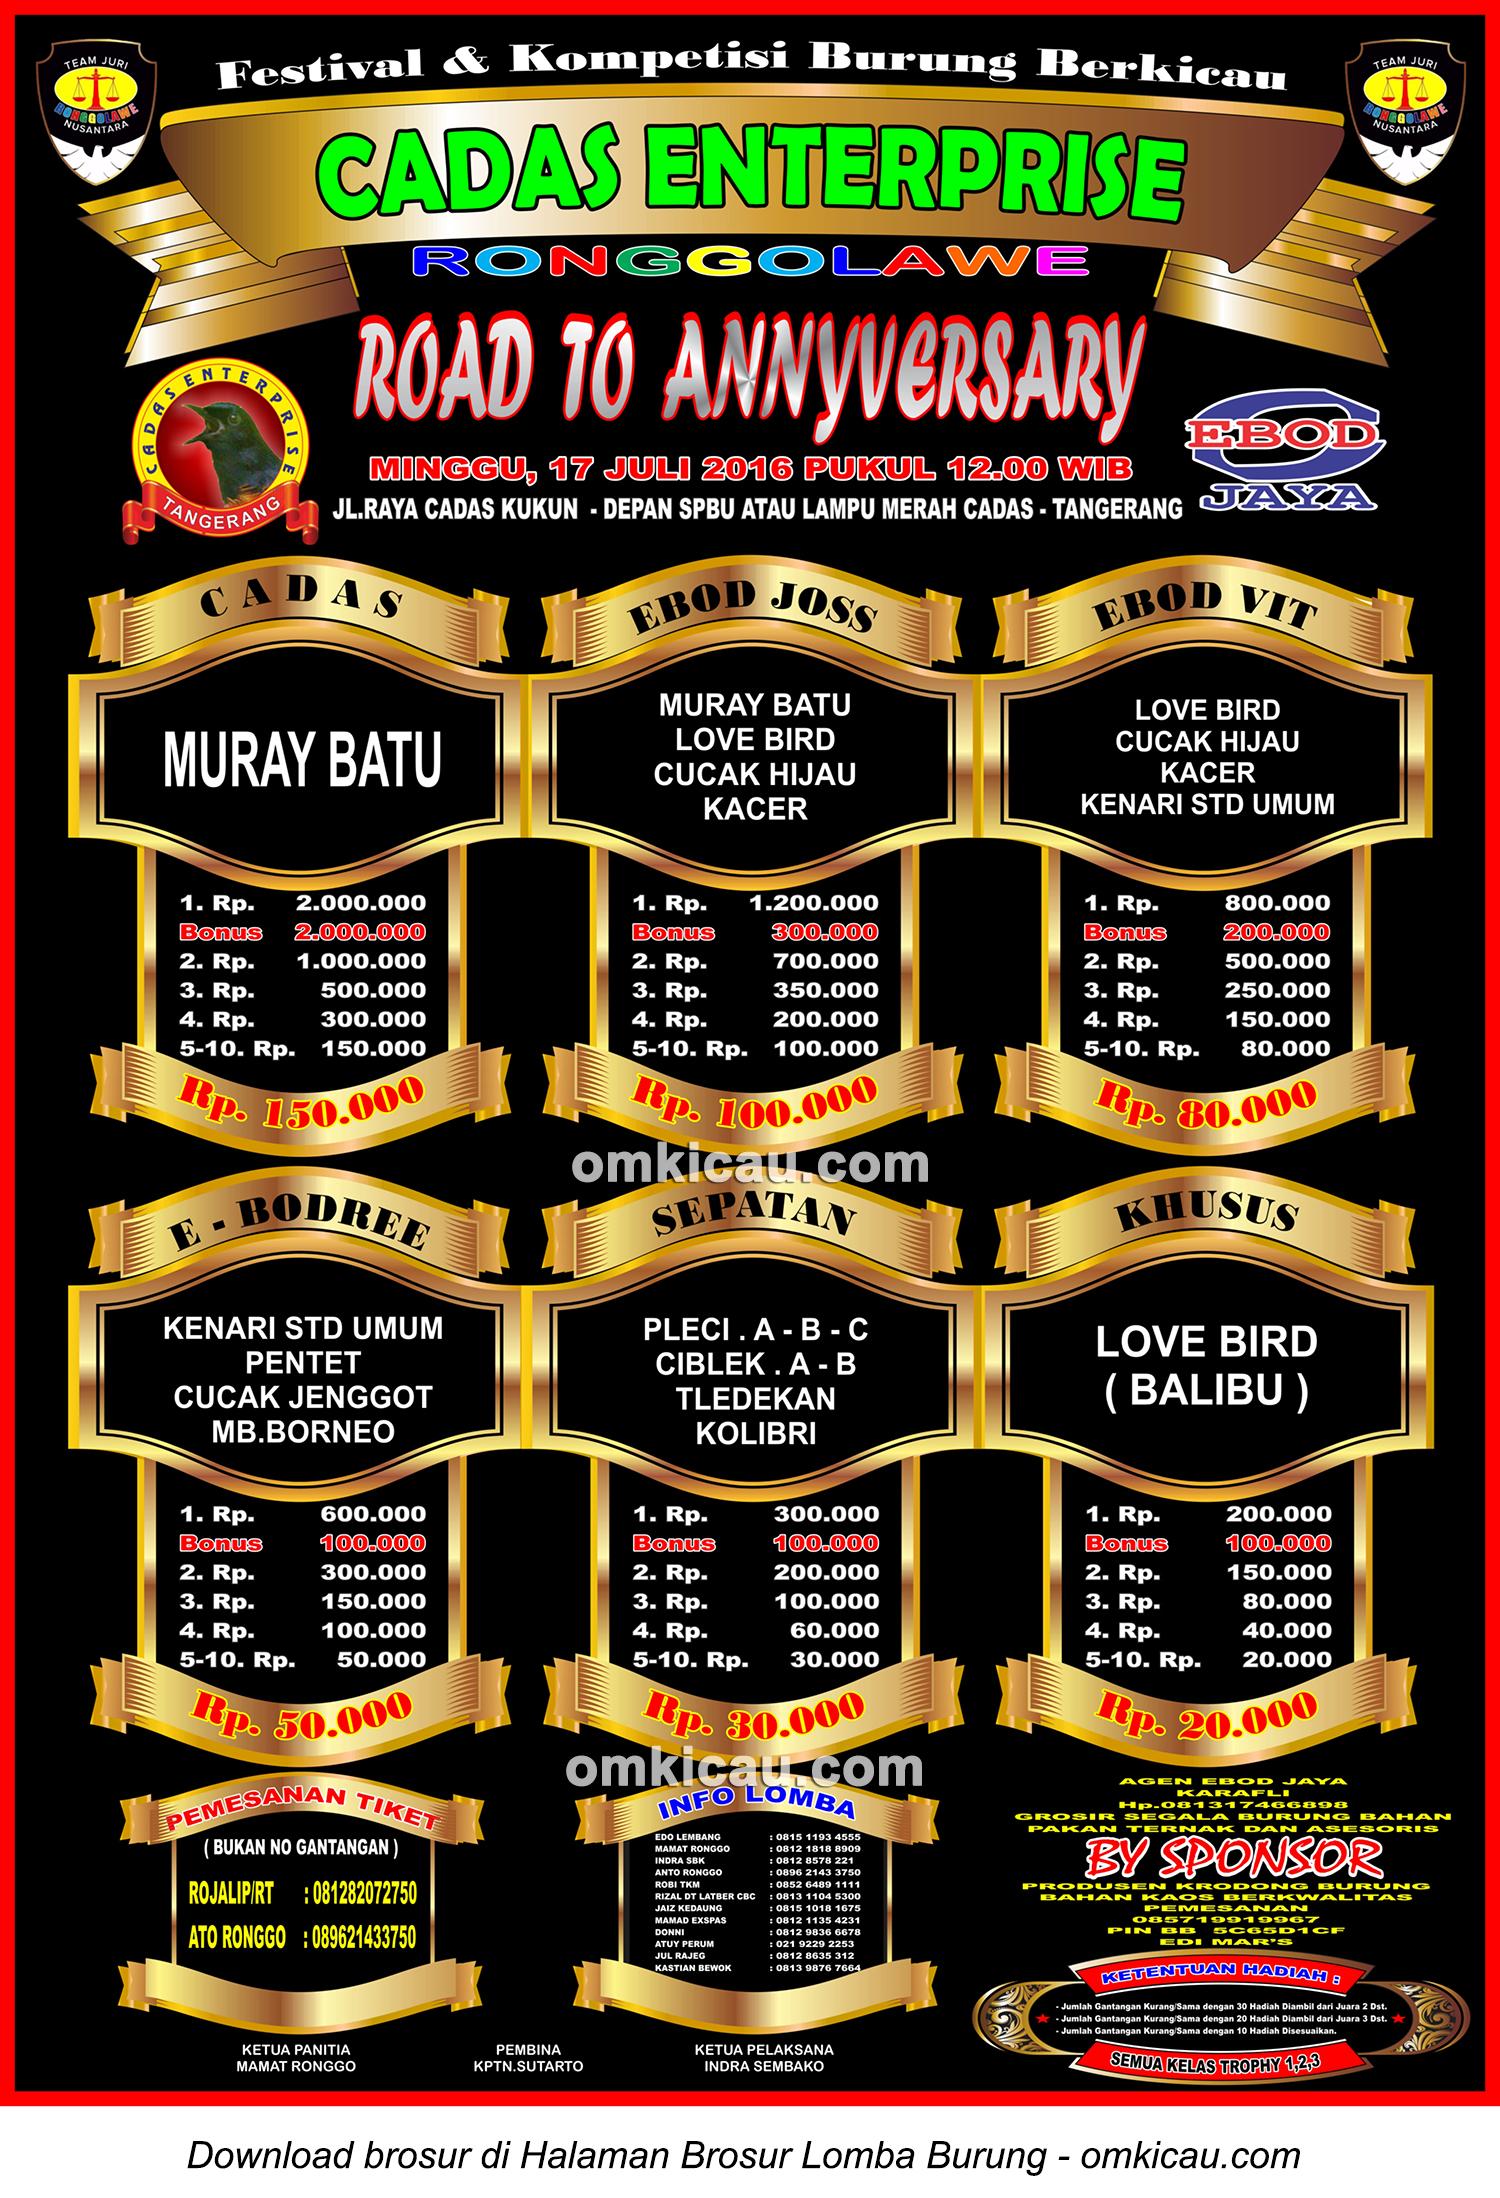 Brosur Lomba Burung Berkicau Road to Anniversary Cadas Enterprise, Tangerang, Minggu 17 Juli 2016